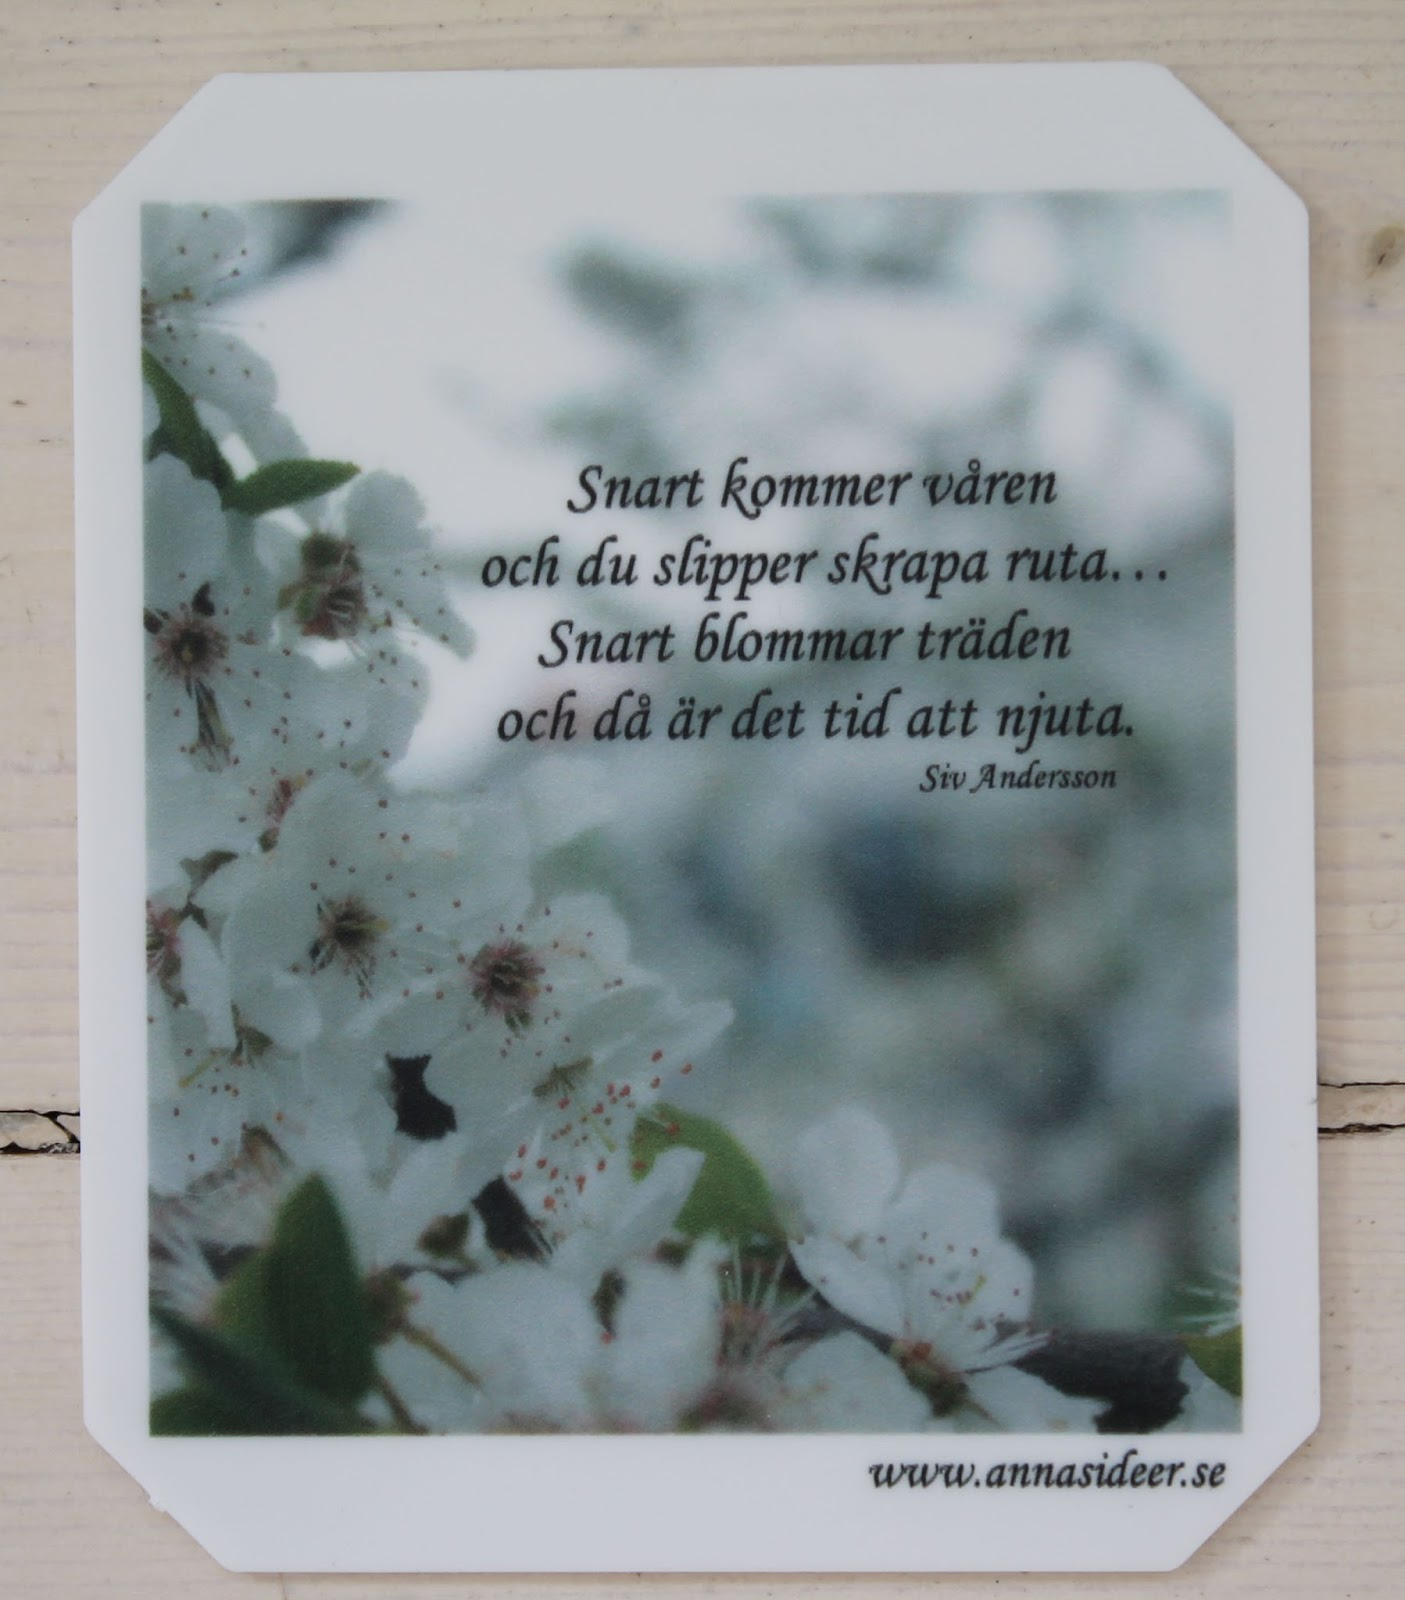 grattis i efterskott dikt Annas idéer bloggbutik: 2015 grattis i efterskott dikt